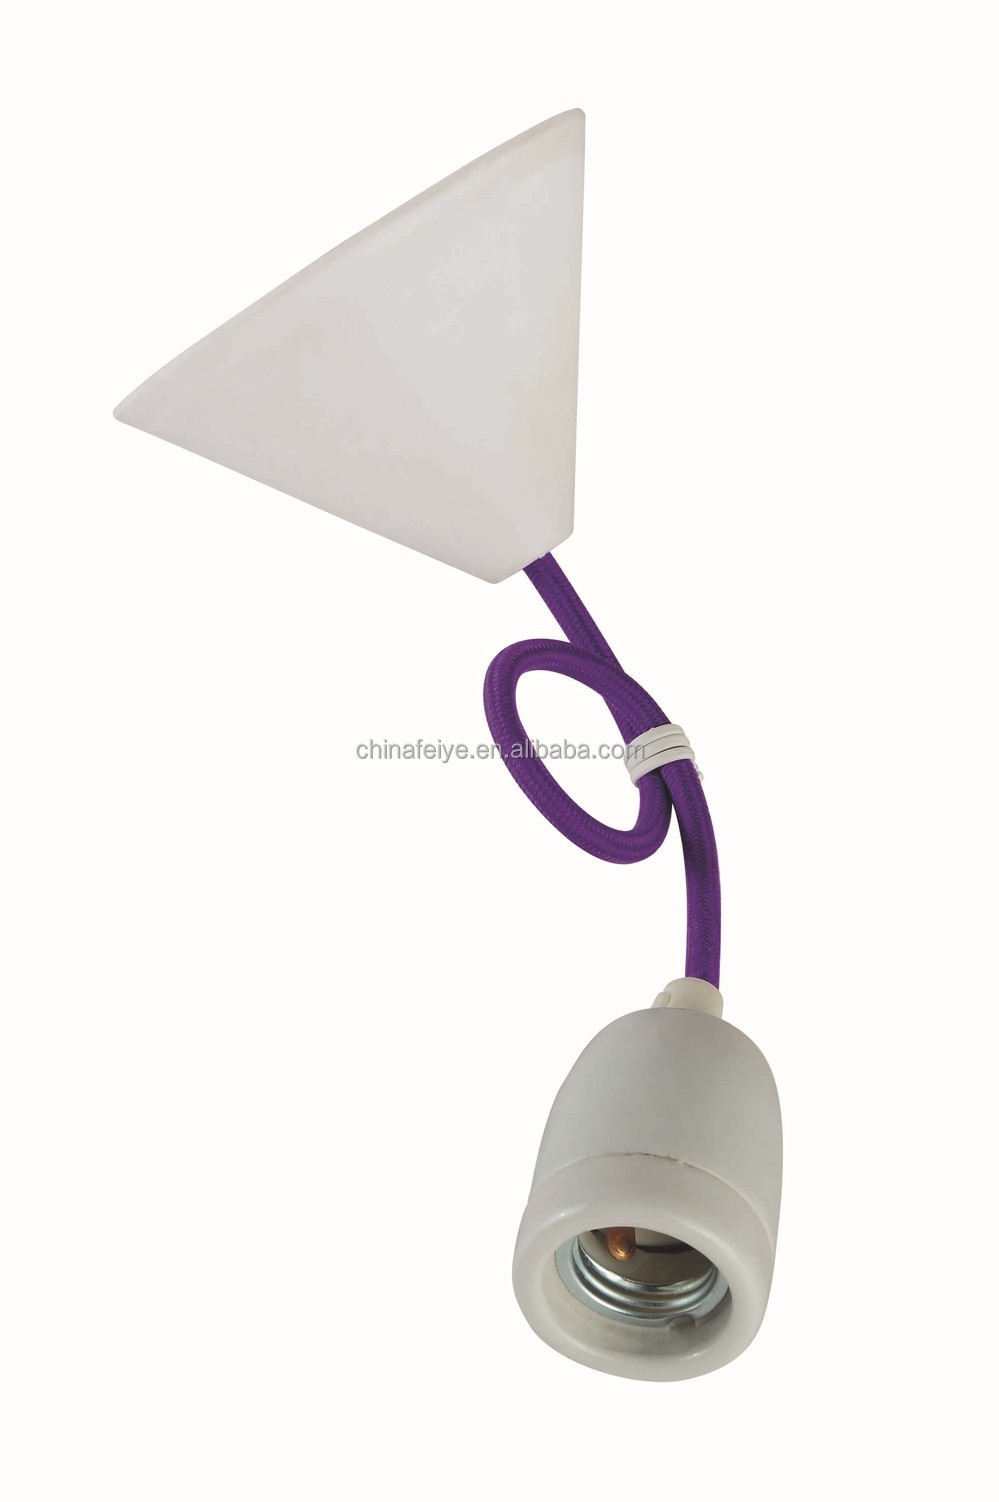 Purplependant lightcolor fabric cordceramic lamp holderplastic purplependant lightcolor fabric cordceramic lamp holderplastic ceiling rose aloadofball Choice Image